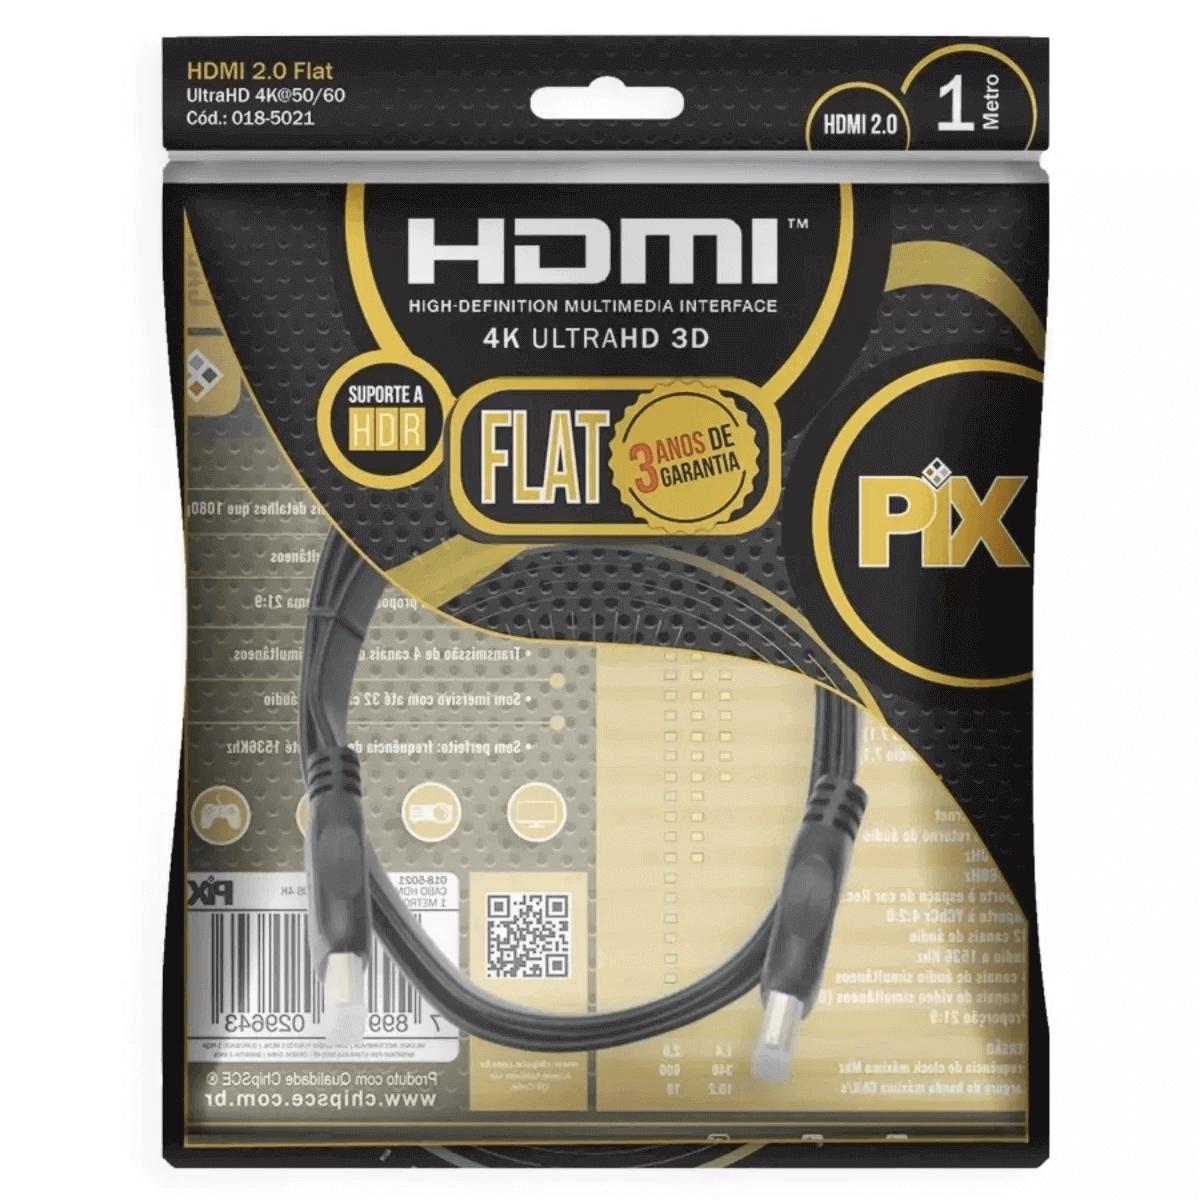 Kit 2 Cabo Hdmi Flat 2.0 Pix 19 Pinos 4k Ultrahd 3d Hdr 1 M